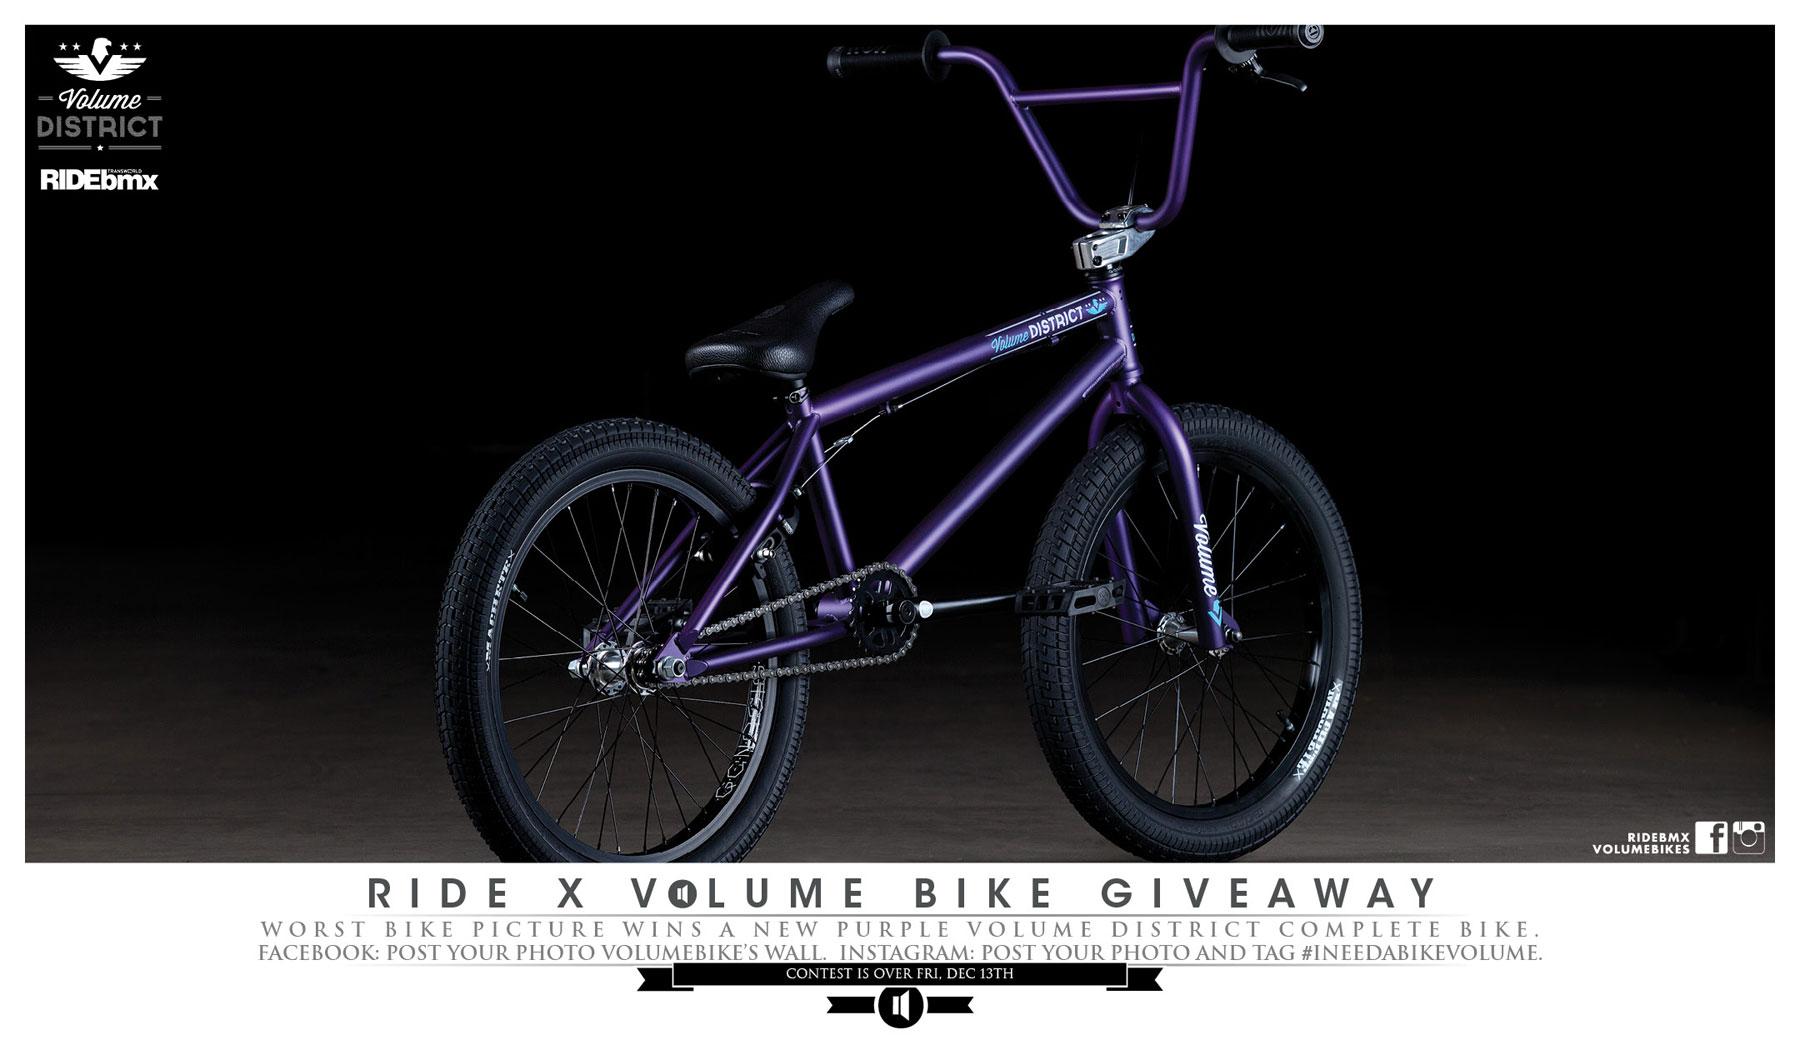 volume-ride-giveaway